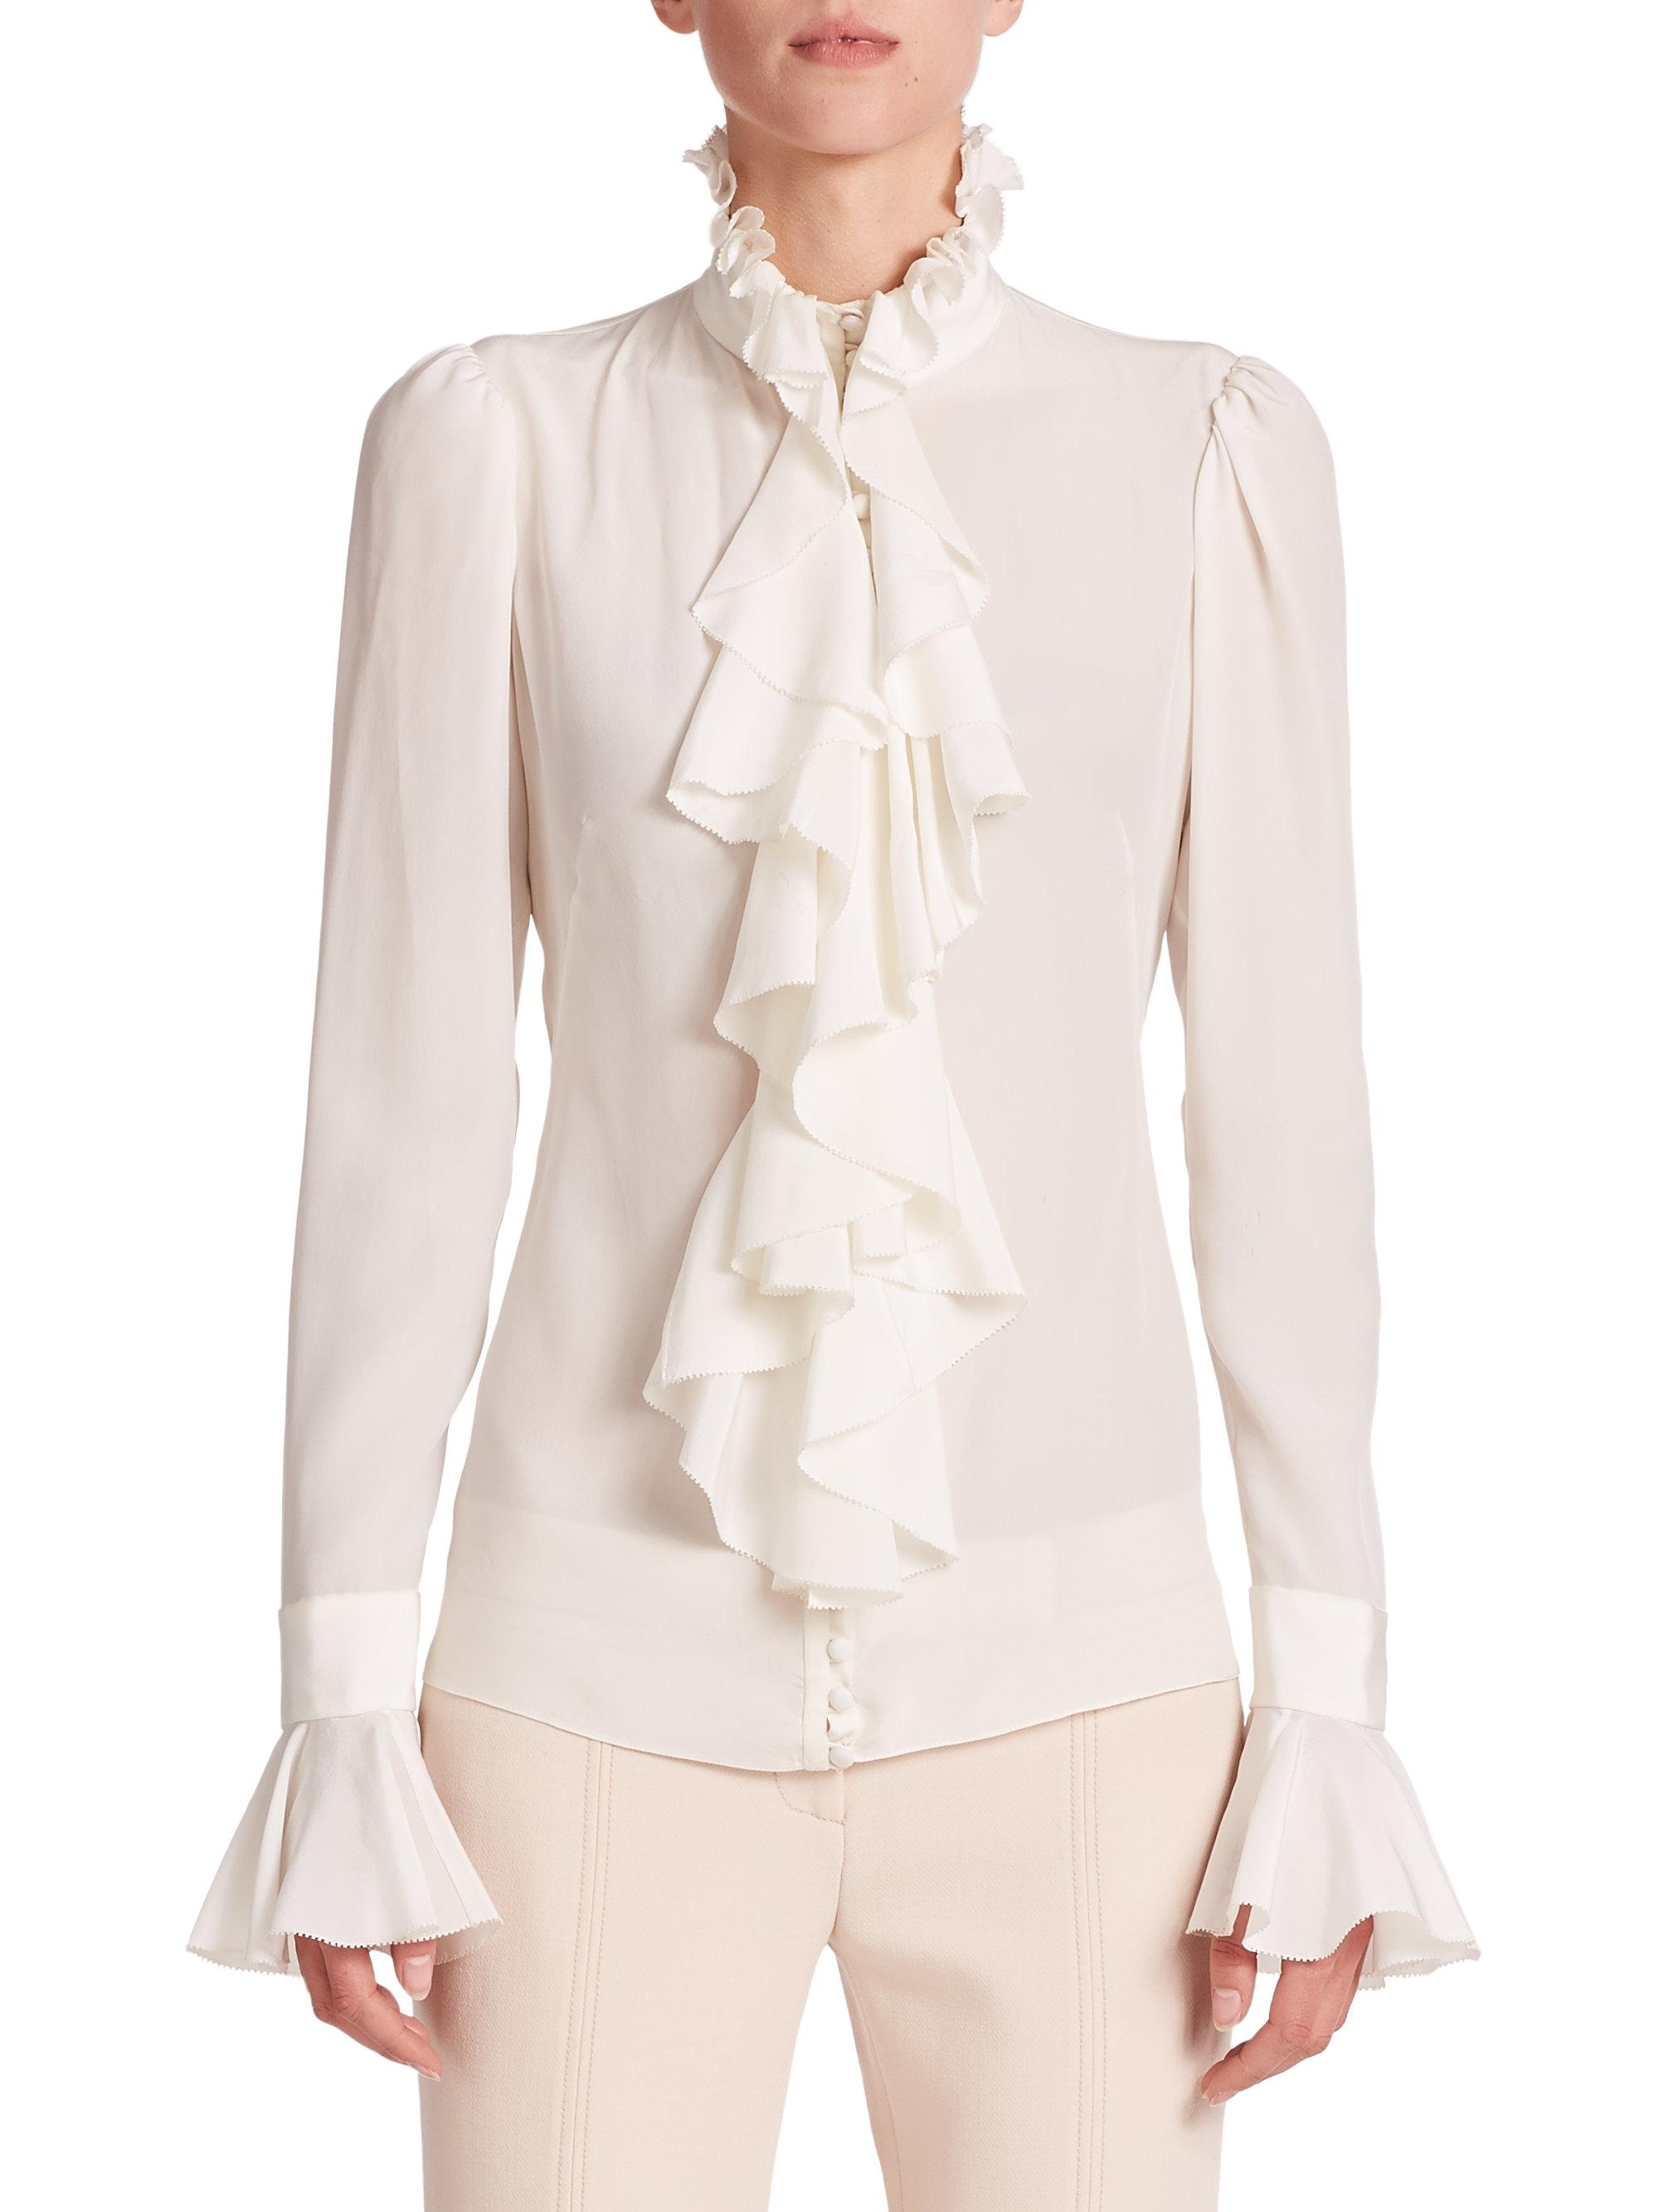 a2f134d4c986 Lyst - Alexander McQueen Silk Ruffle Blouse in White